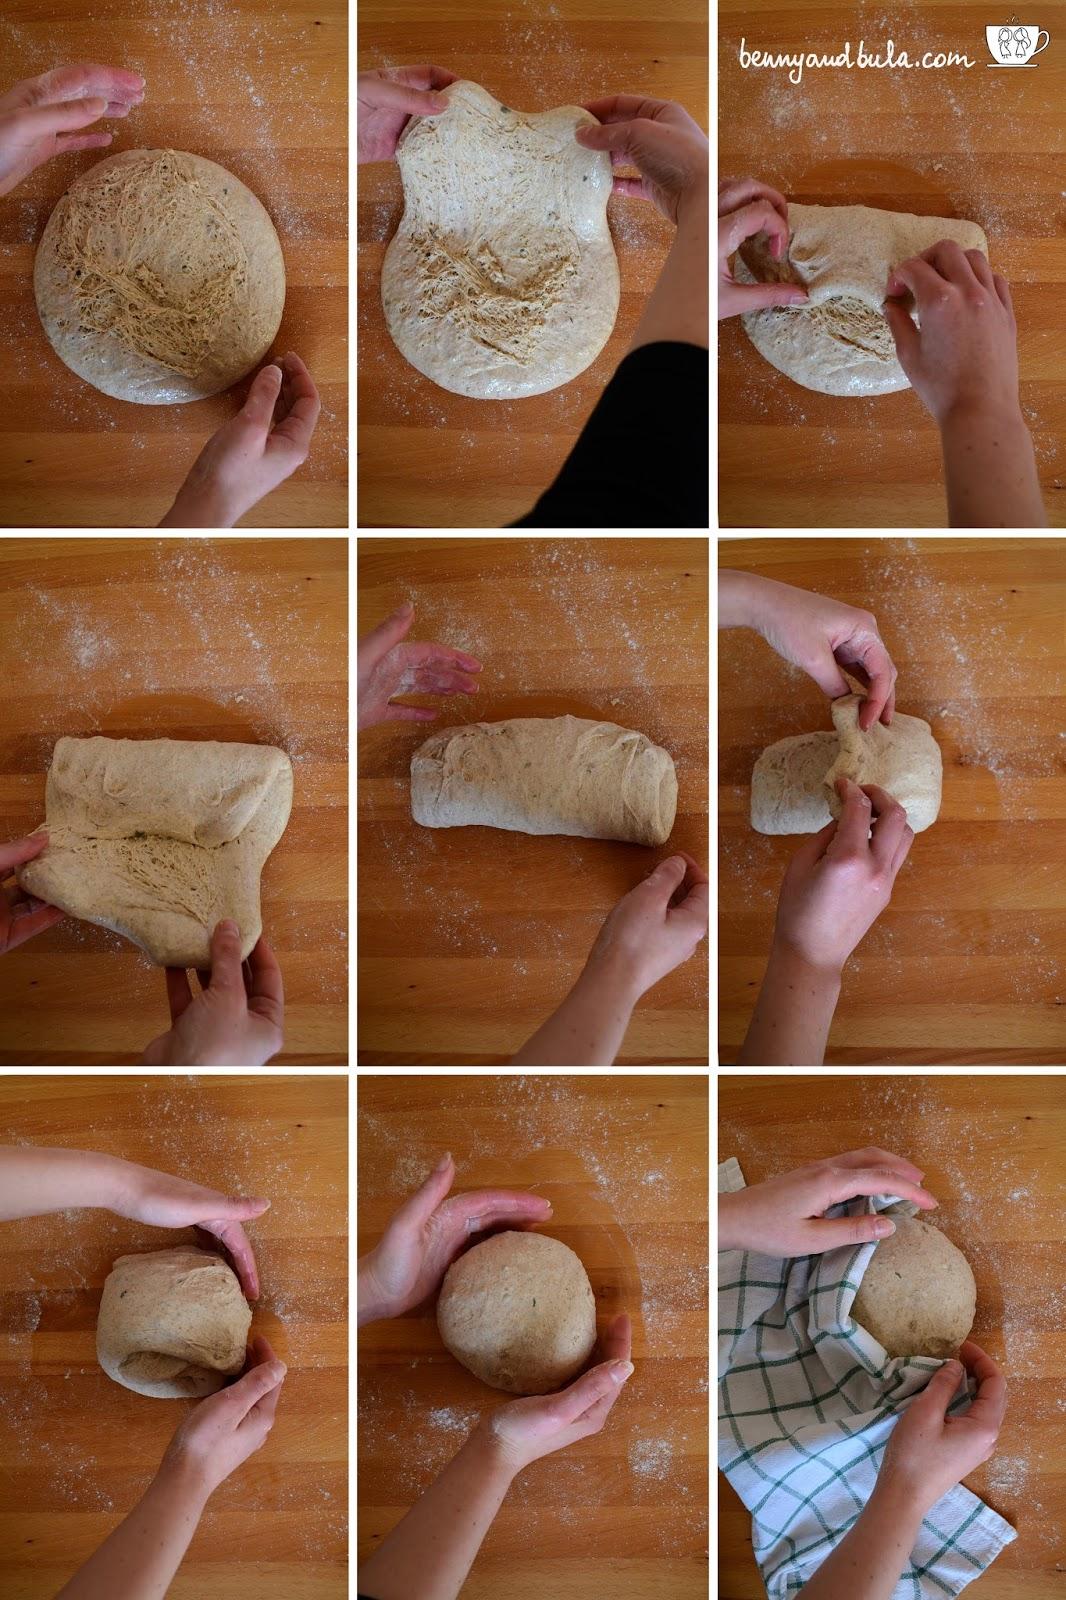 spiegazione pieghe a 3 o portafoglio/step by step bread folding tutorial